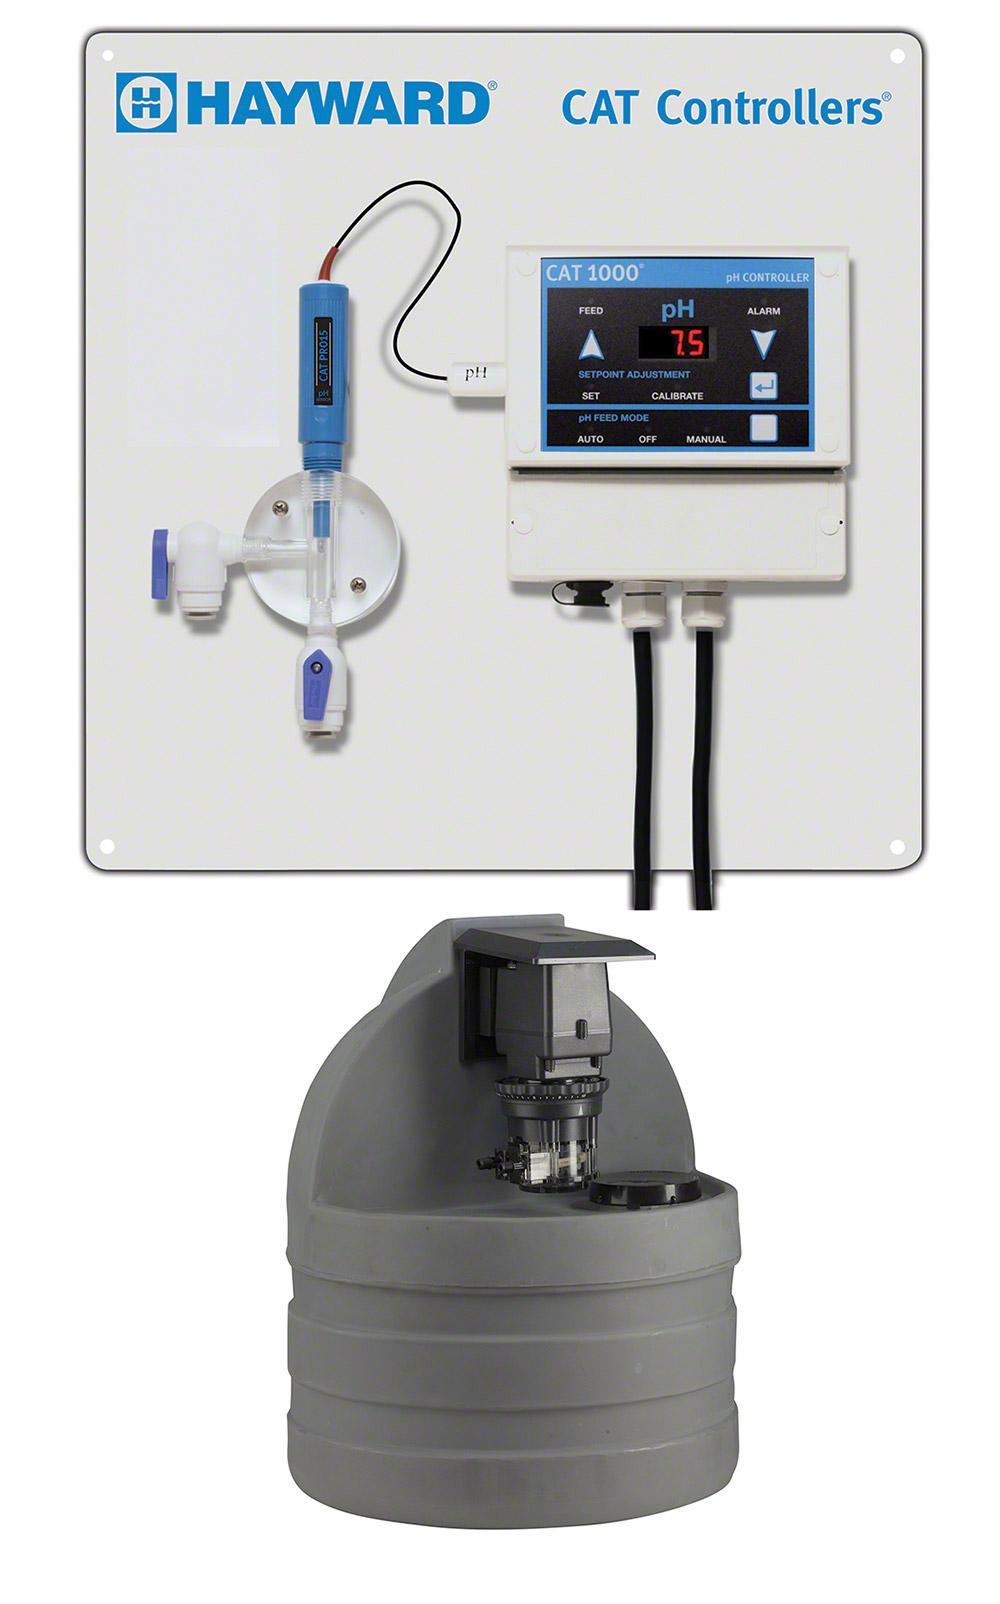 Hayward CAT 1000 pH controller w Pump and Tank Combo